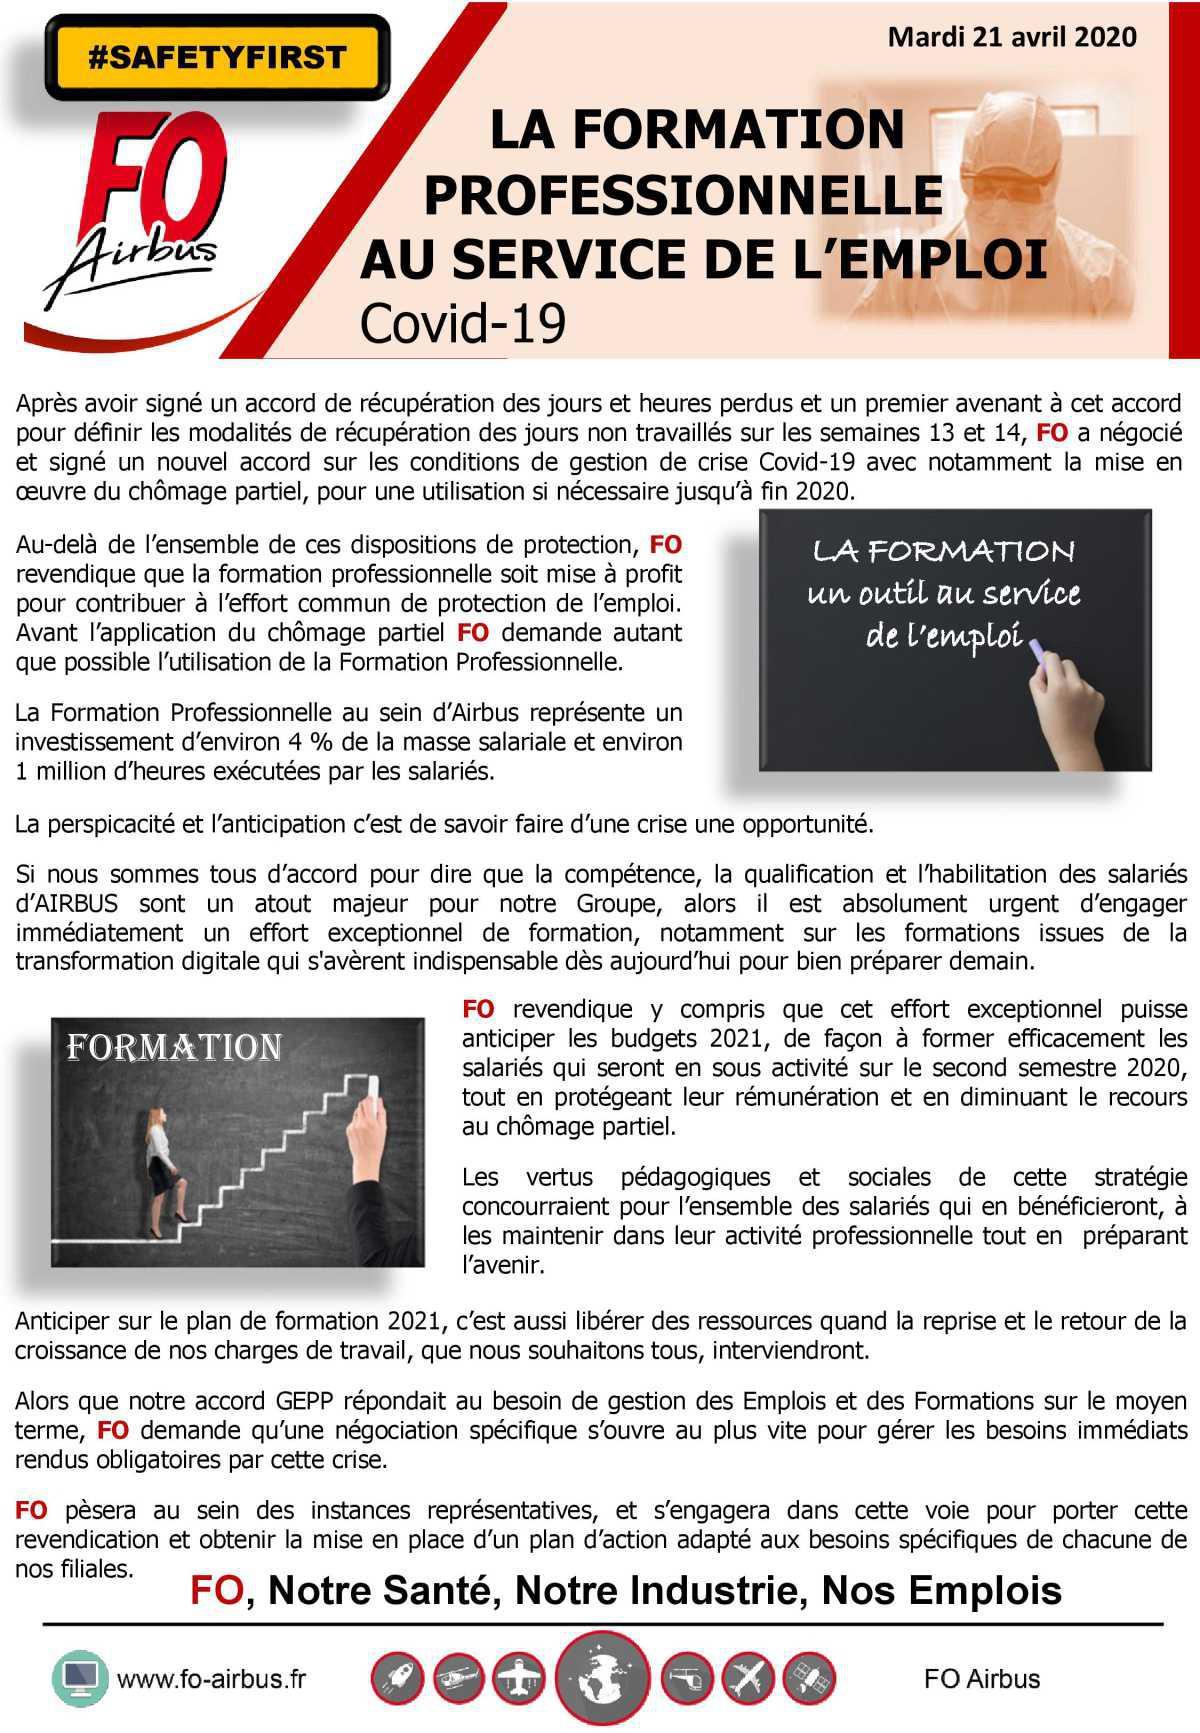 La formation professionnelle au service de l'emploi - COVID 19